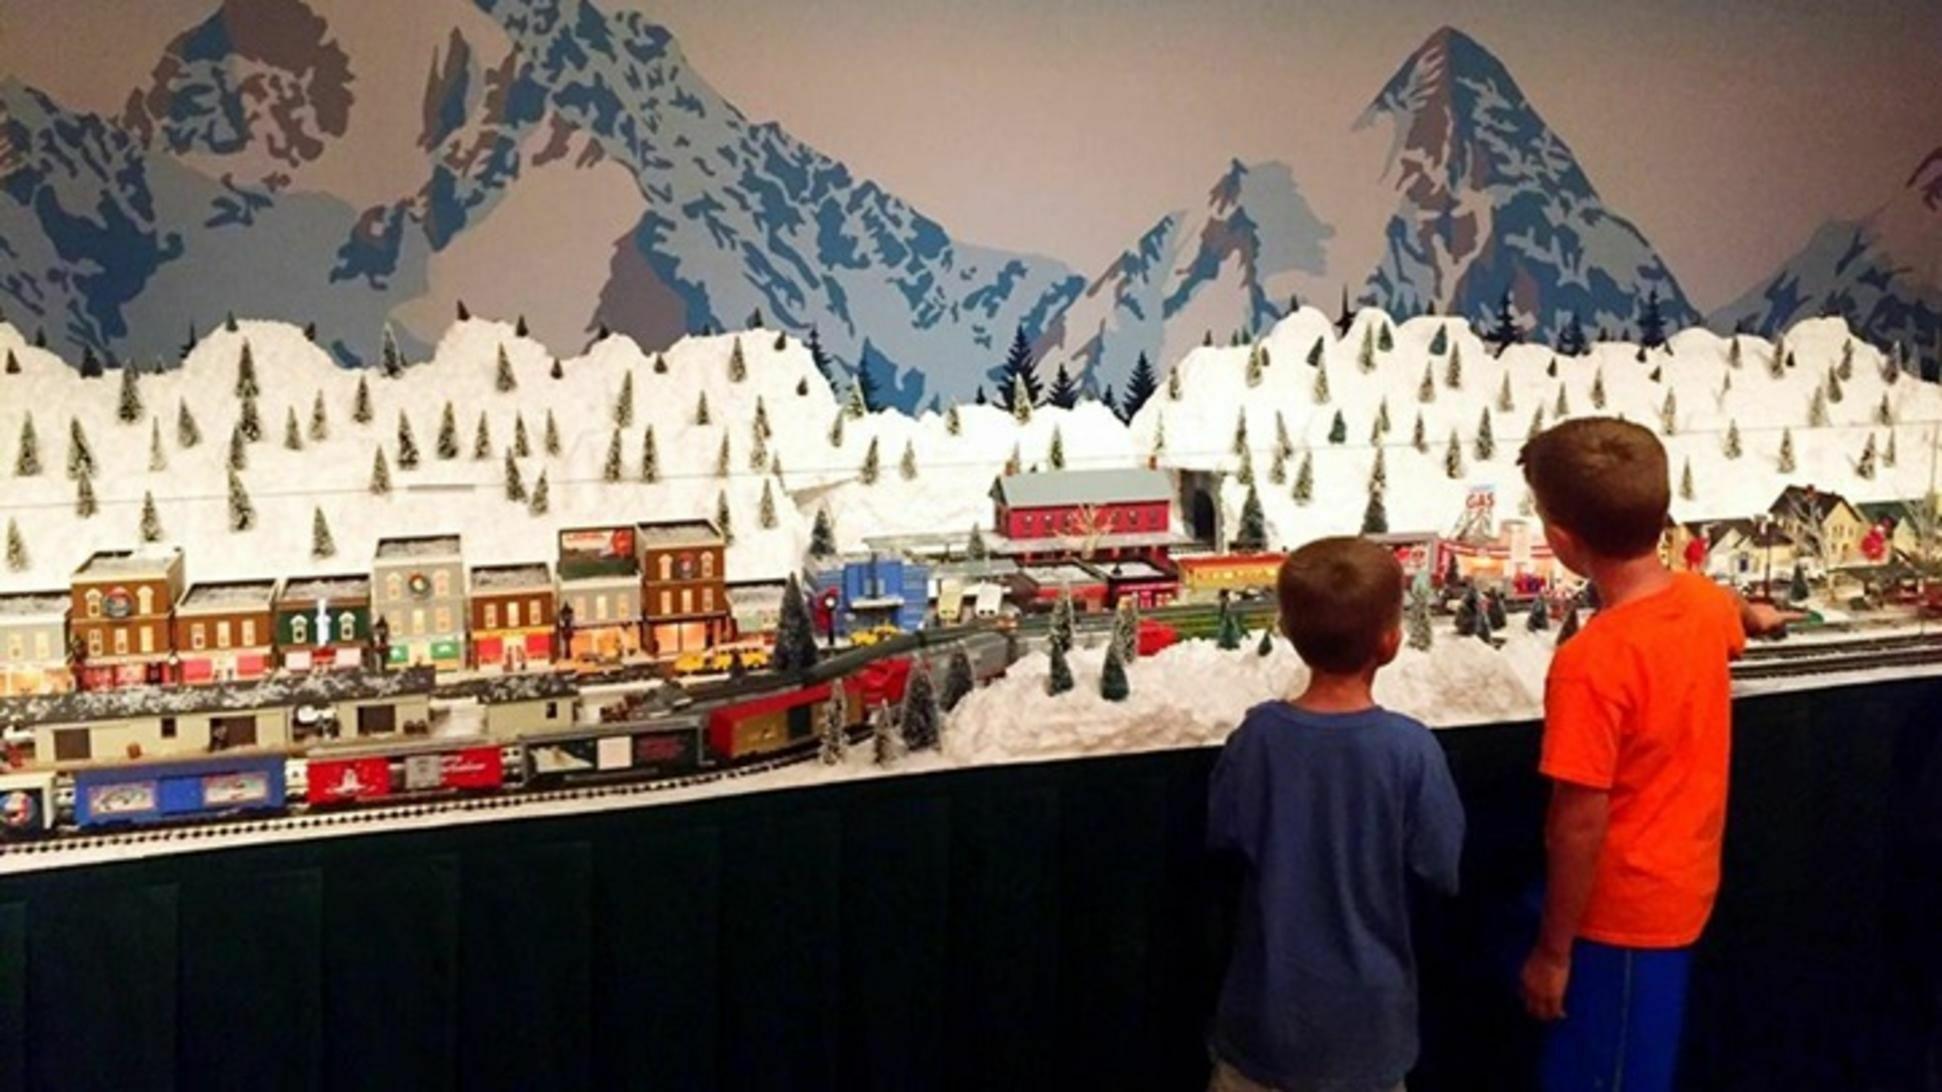 Muzeo Express Holiday Train Exhibition